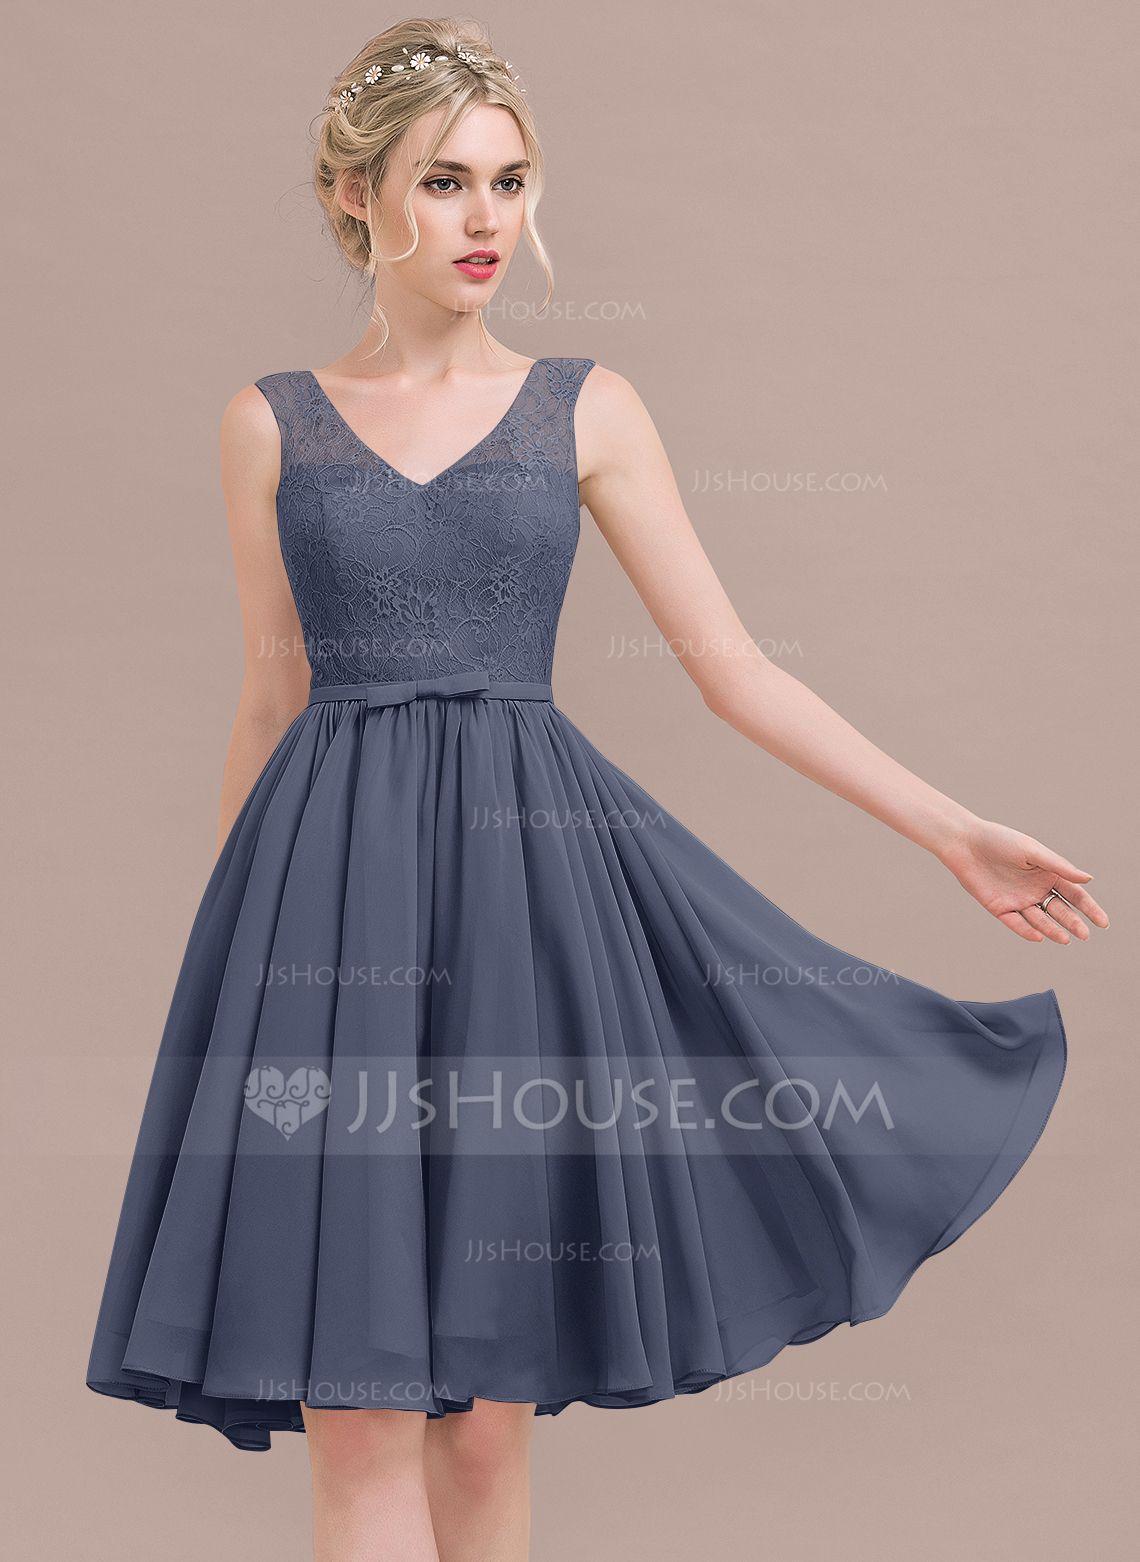 ecda295a45f55 A-Line/Princess V-neck Knee-Length Chiffon Lace Bridesmaid Dress With  Bow(s) (007116648) - Bridesmaid Dresses - JJsHouse